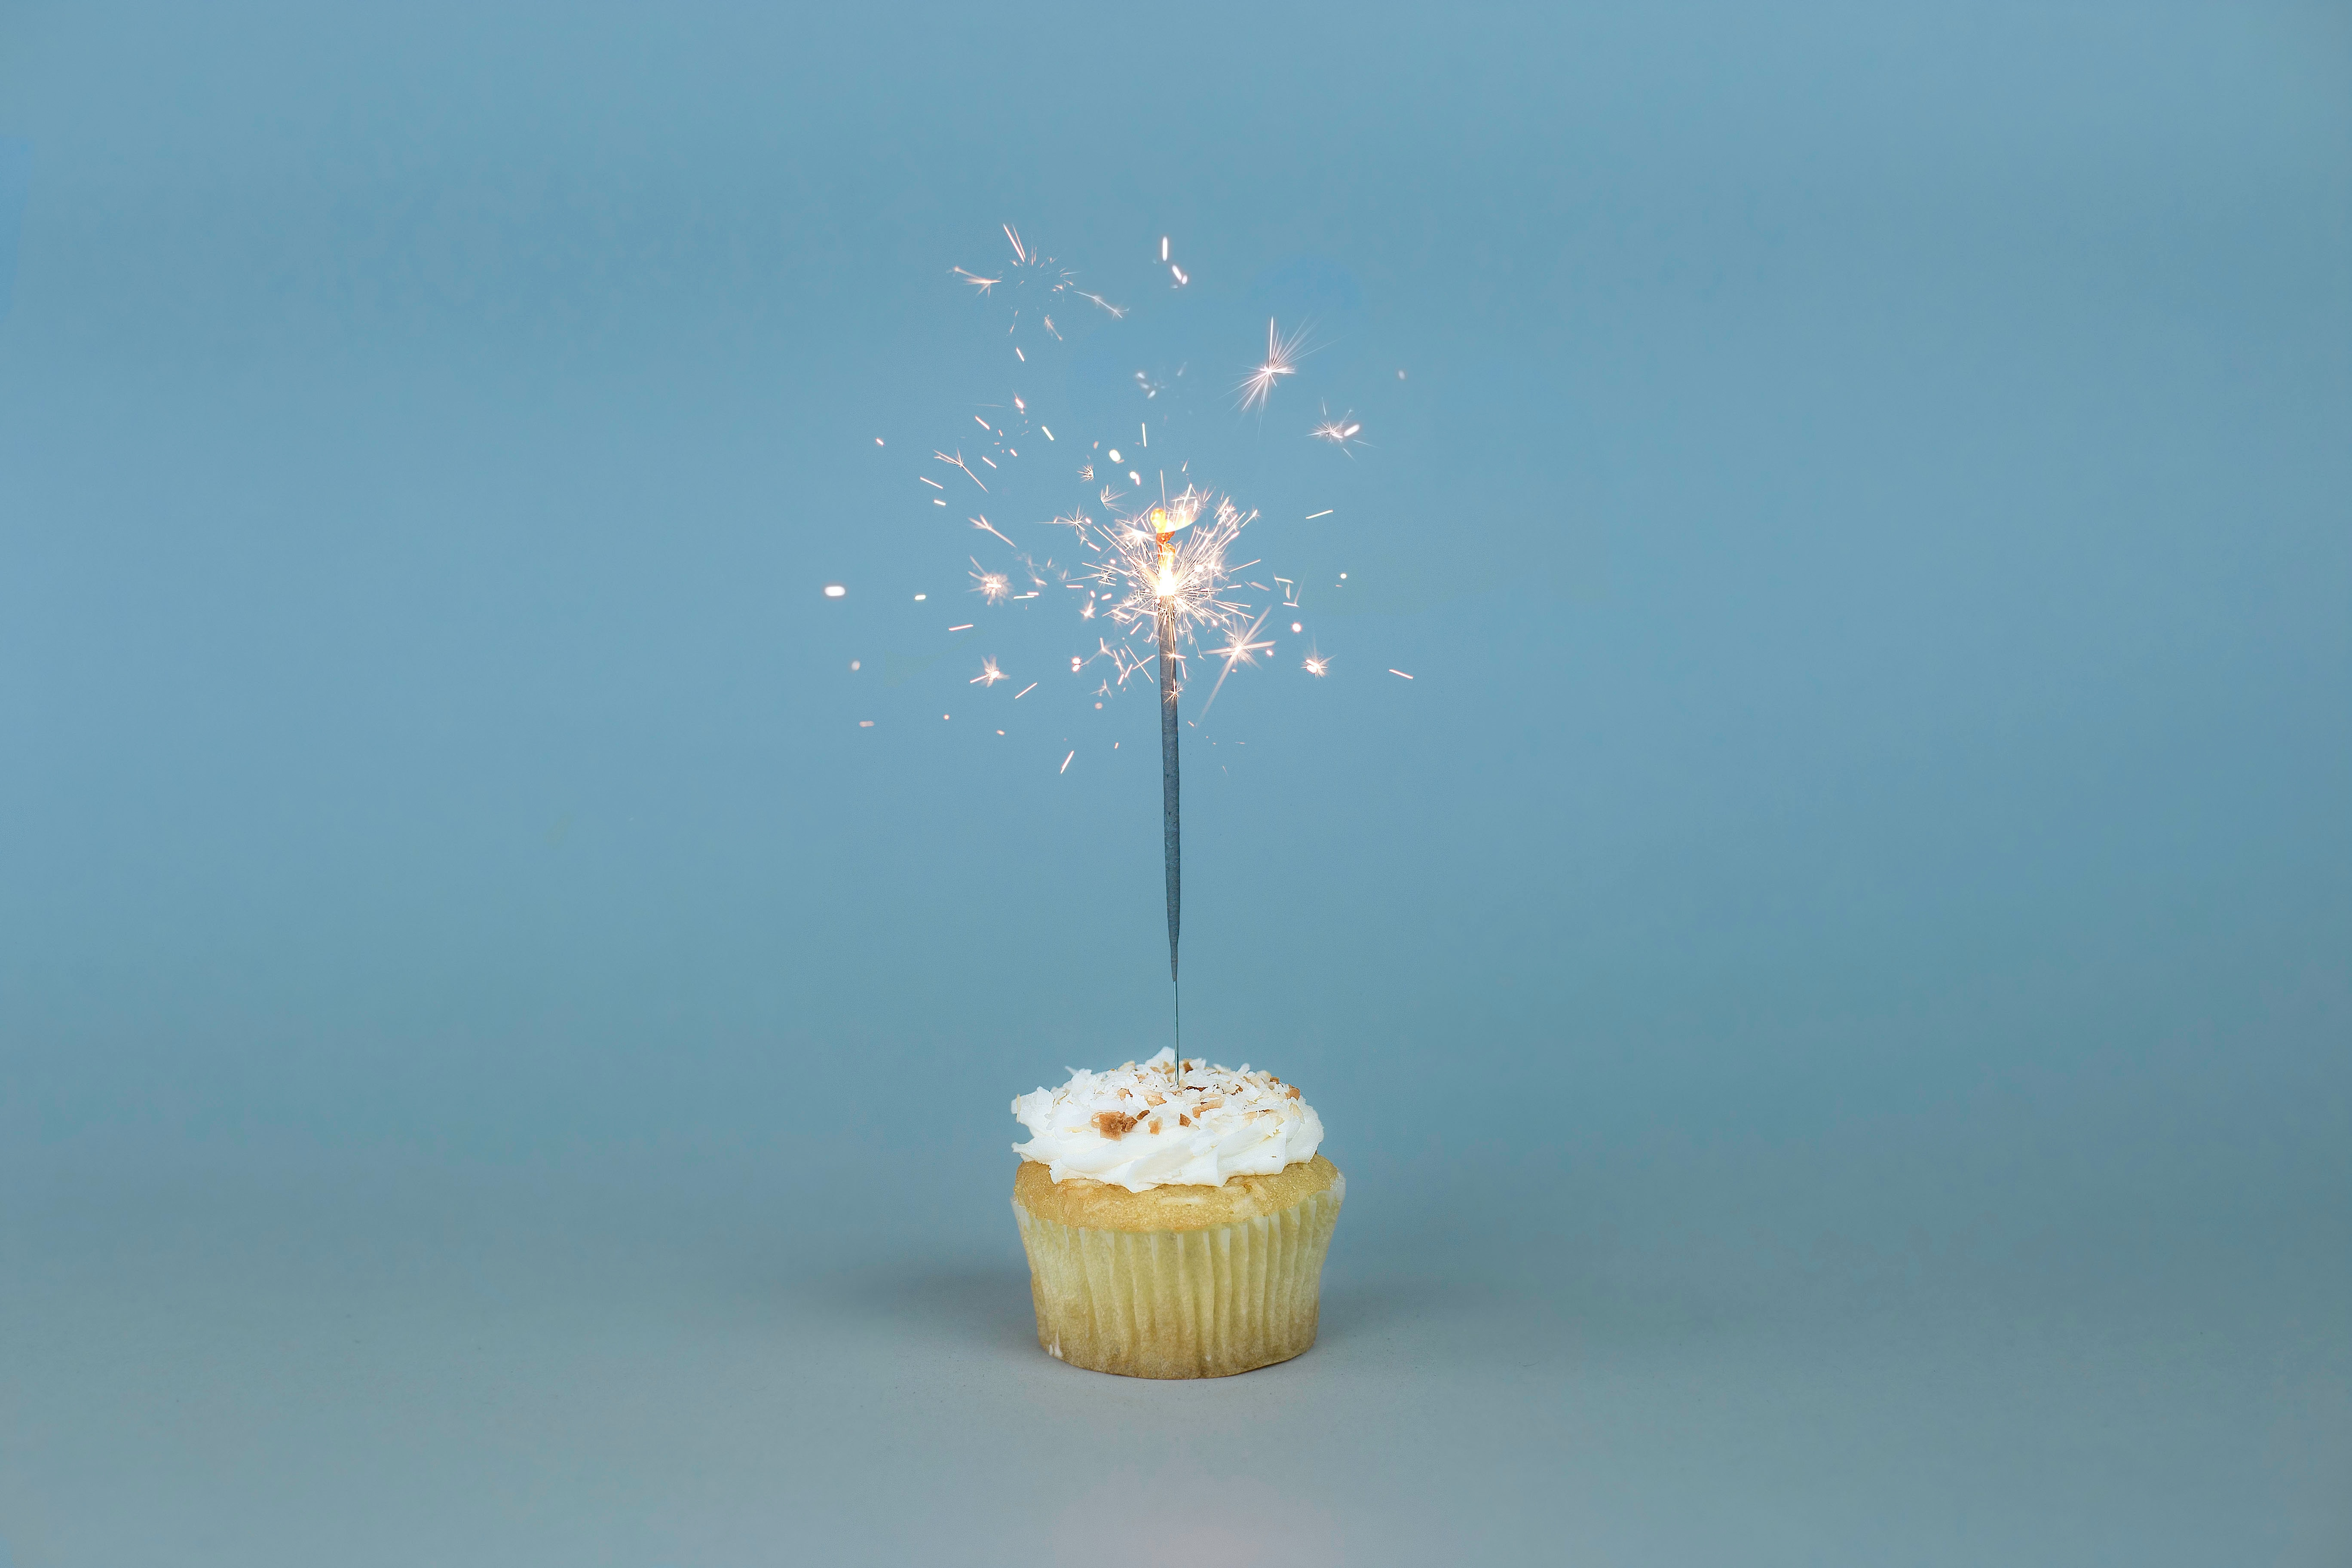 Happy birthday to the Spanish constitution | MINI POLITICS